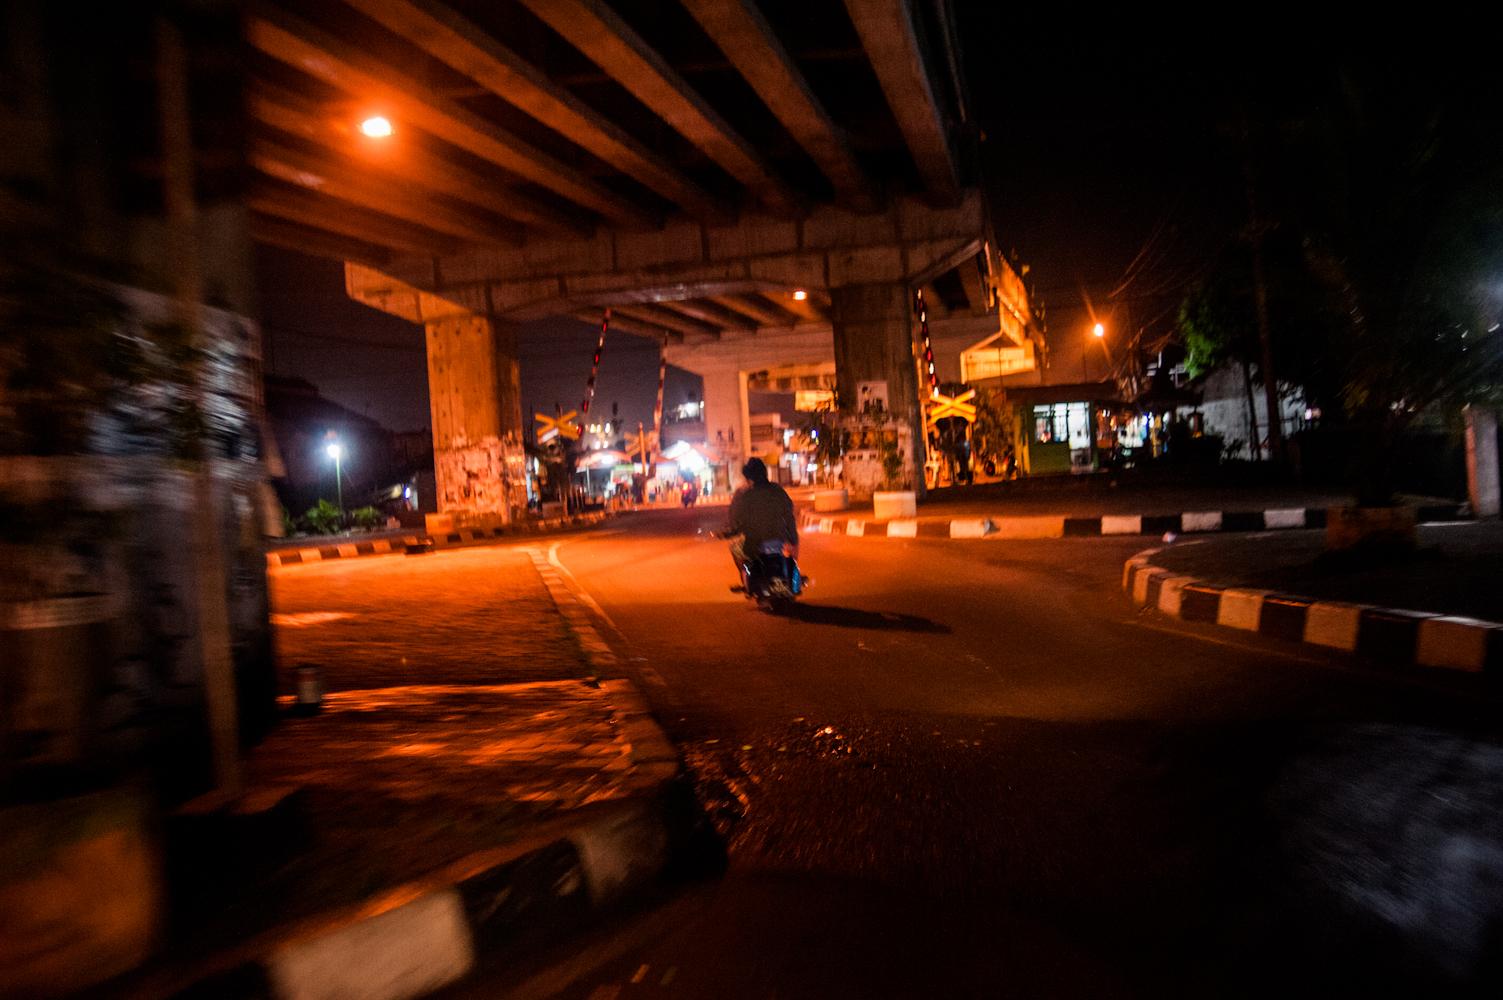 20120625_KEVINMICHAELBRIGGS_indonesia_001-2.jpg